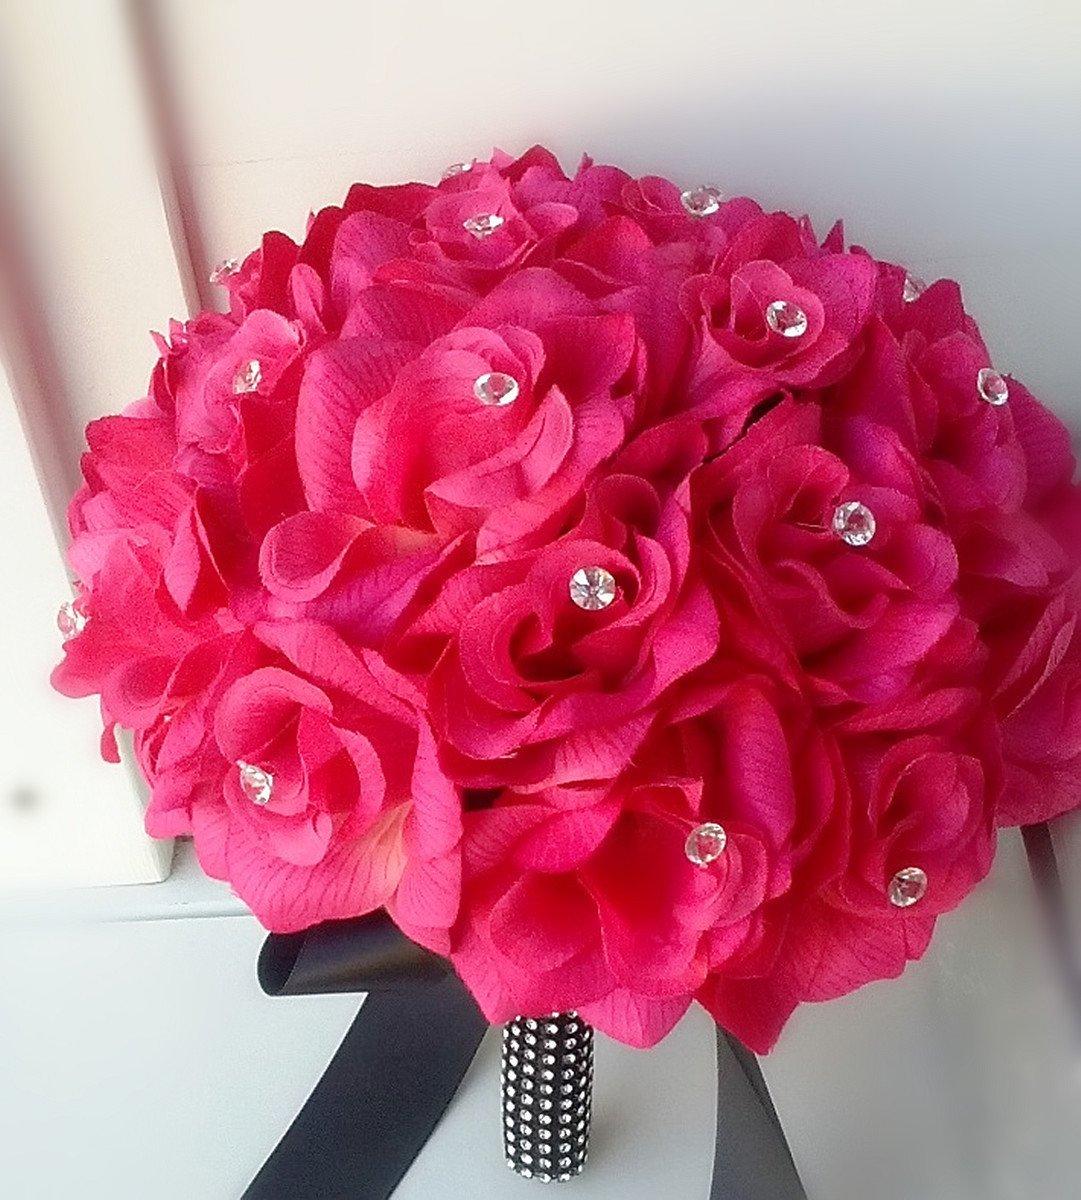 Amazon Hot Pink Rose And Black Ribbon Bridal Wedding Bouquet